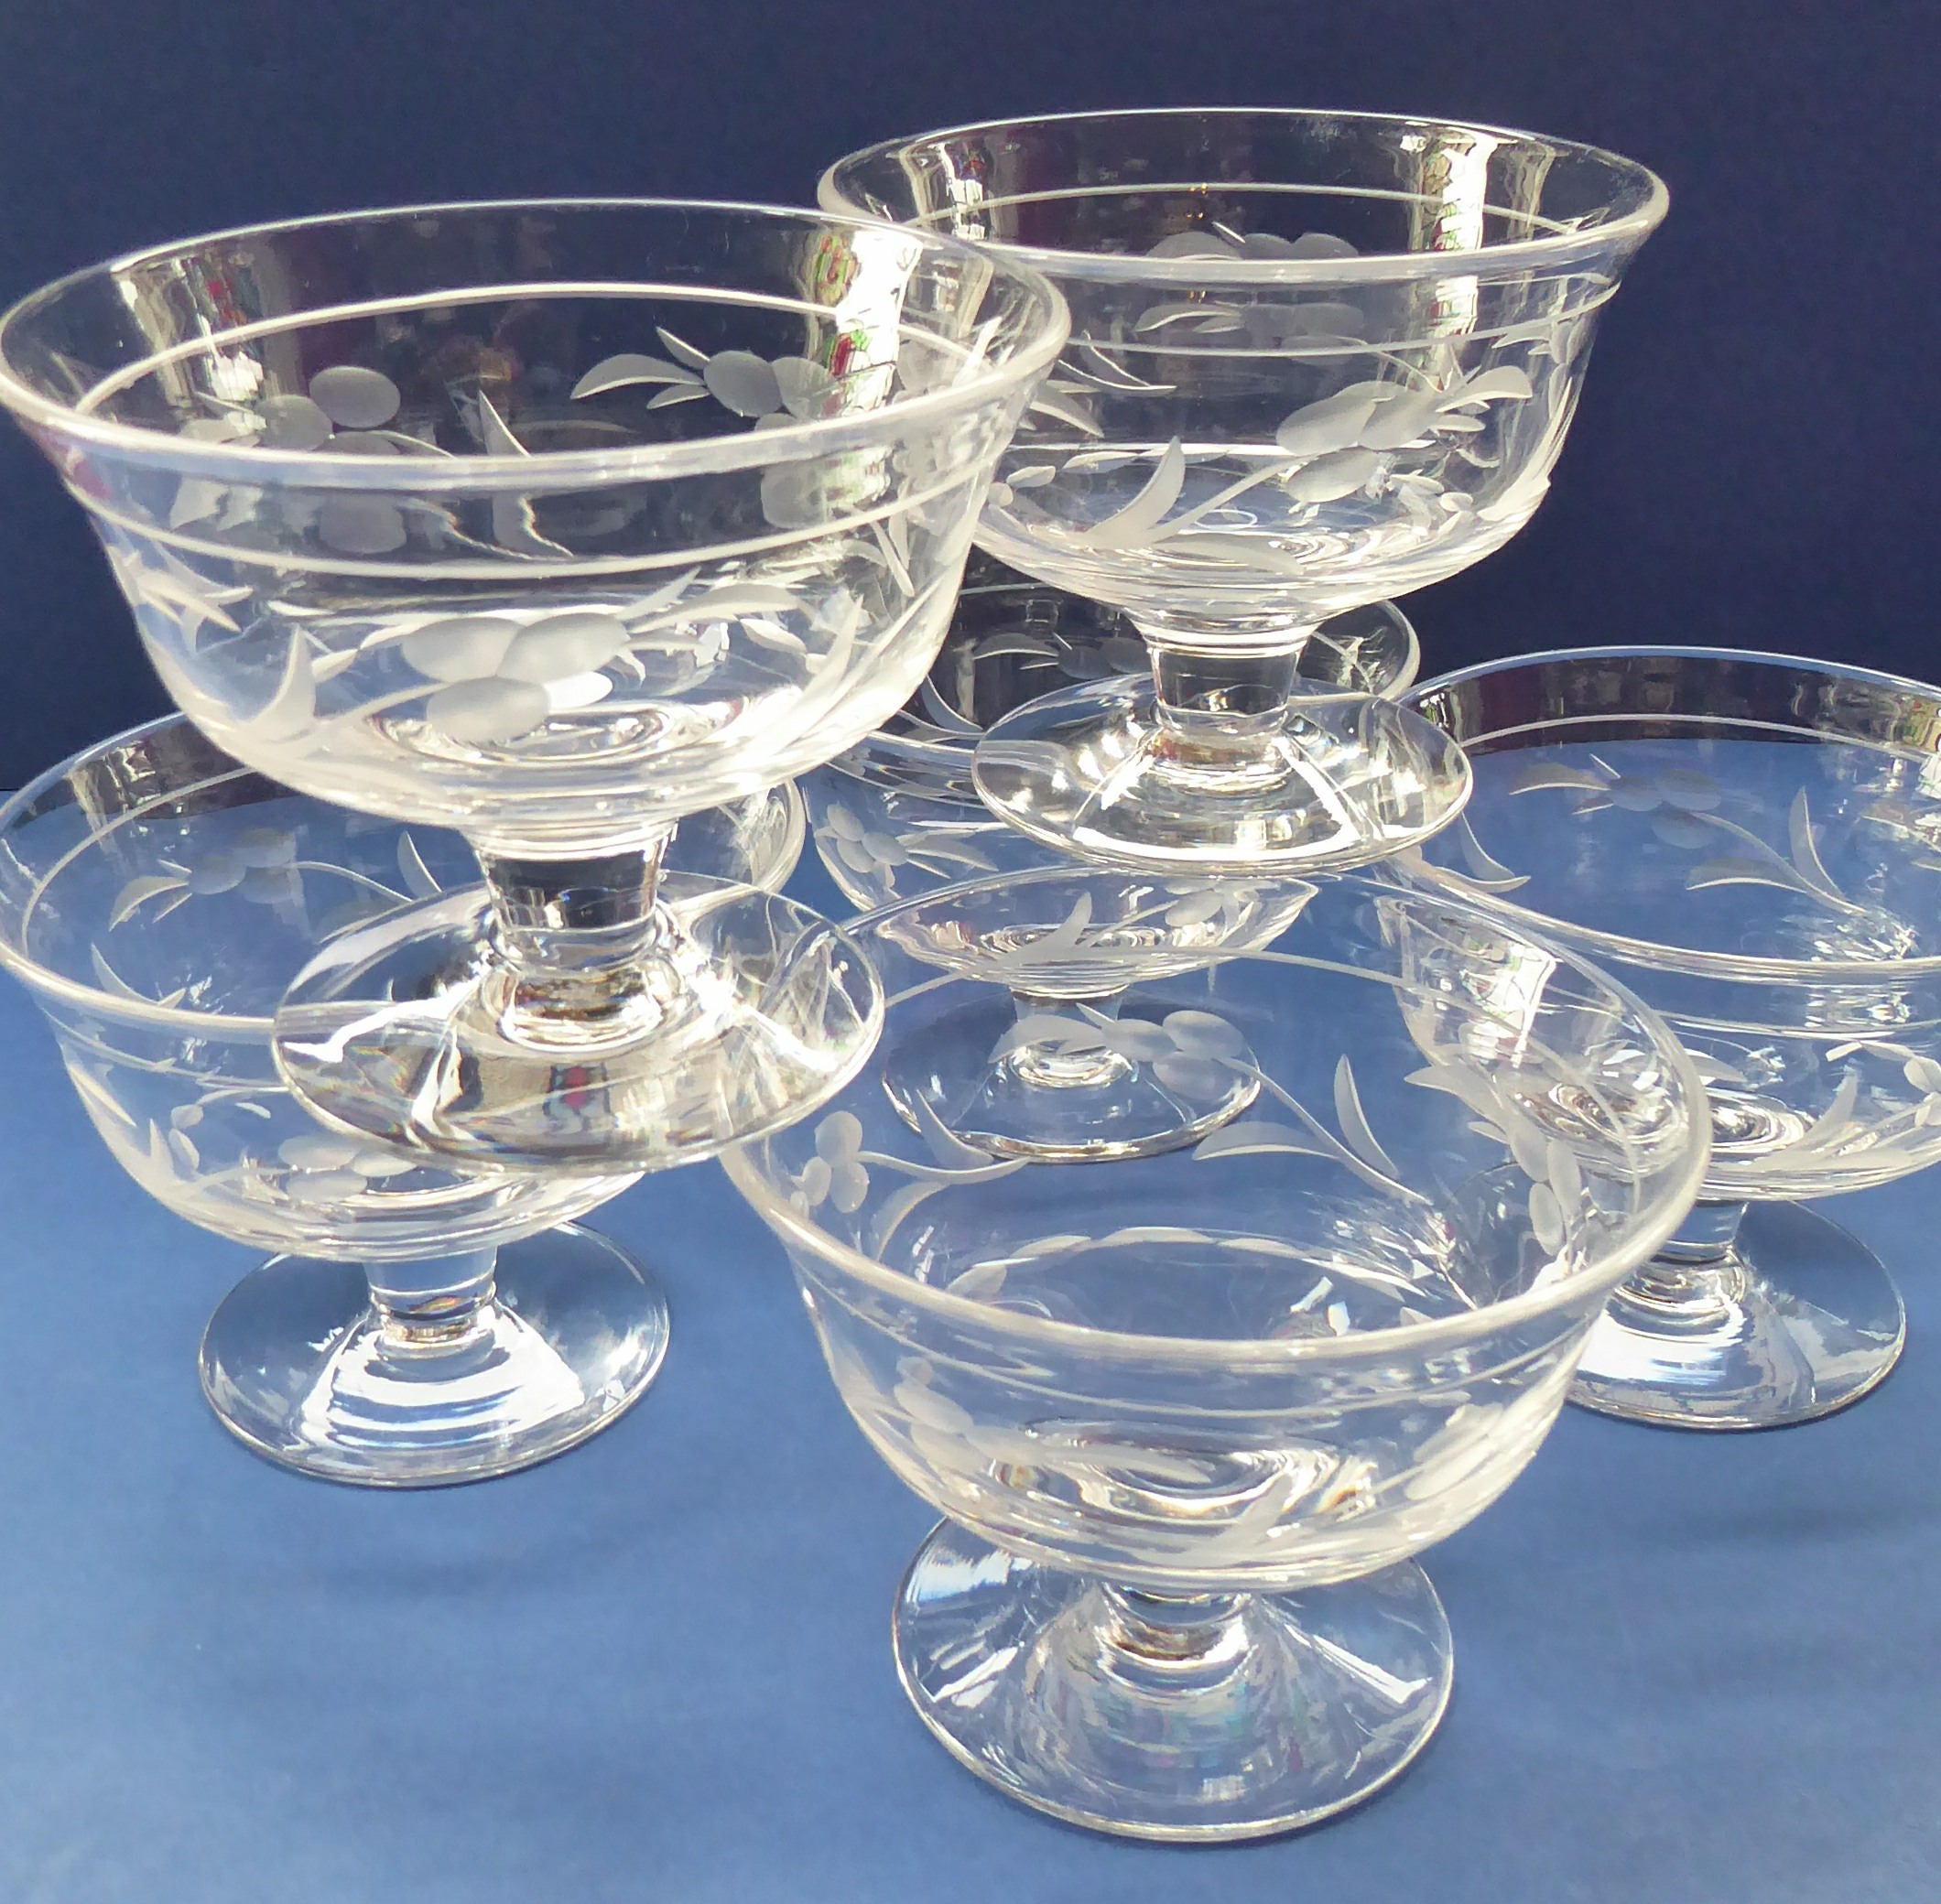 1950s Dishes: 1950s SIX Matching Stuart Crystal Sundae Dishes With